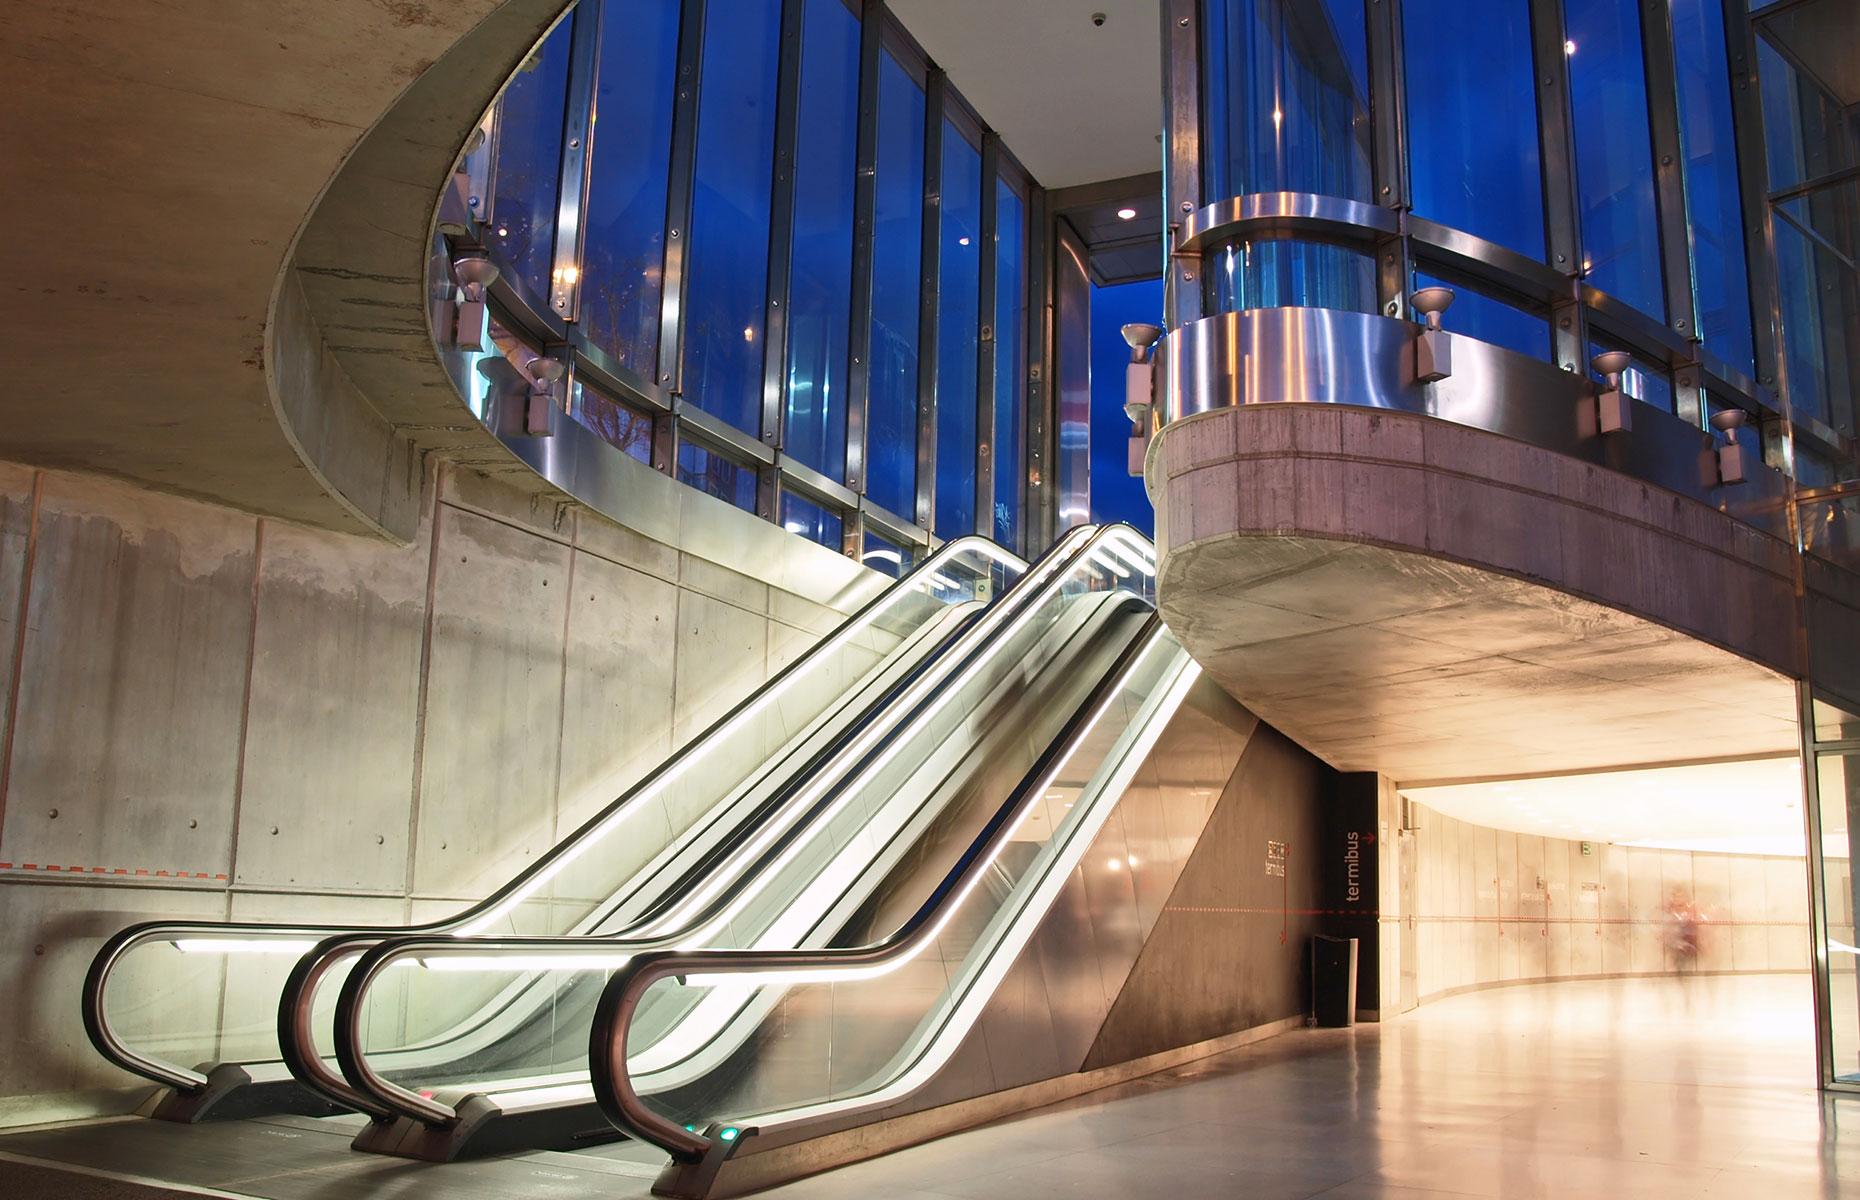 Bilbao's Norman Foster-designed subway (Image: Jarno Gonzalez Zarraonandia/Shutterstock)